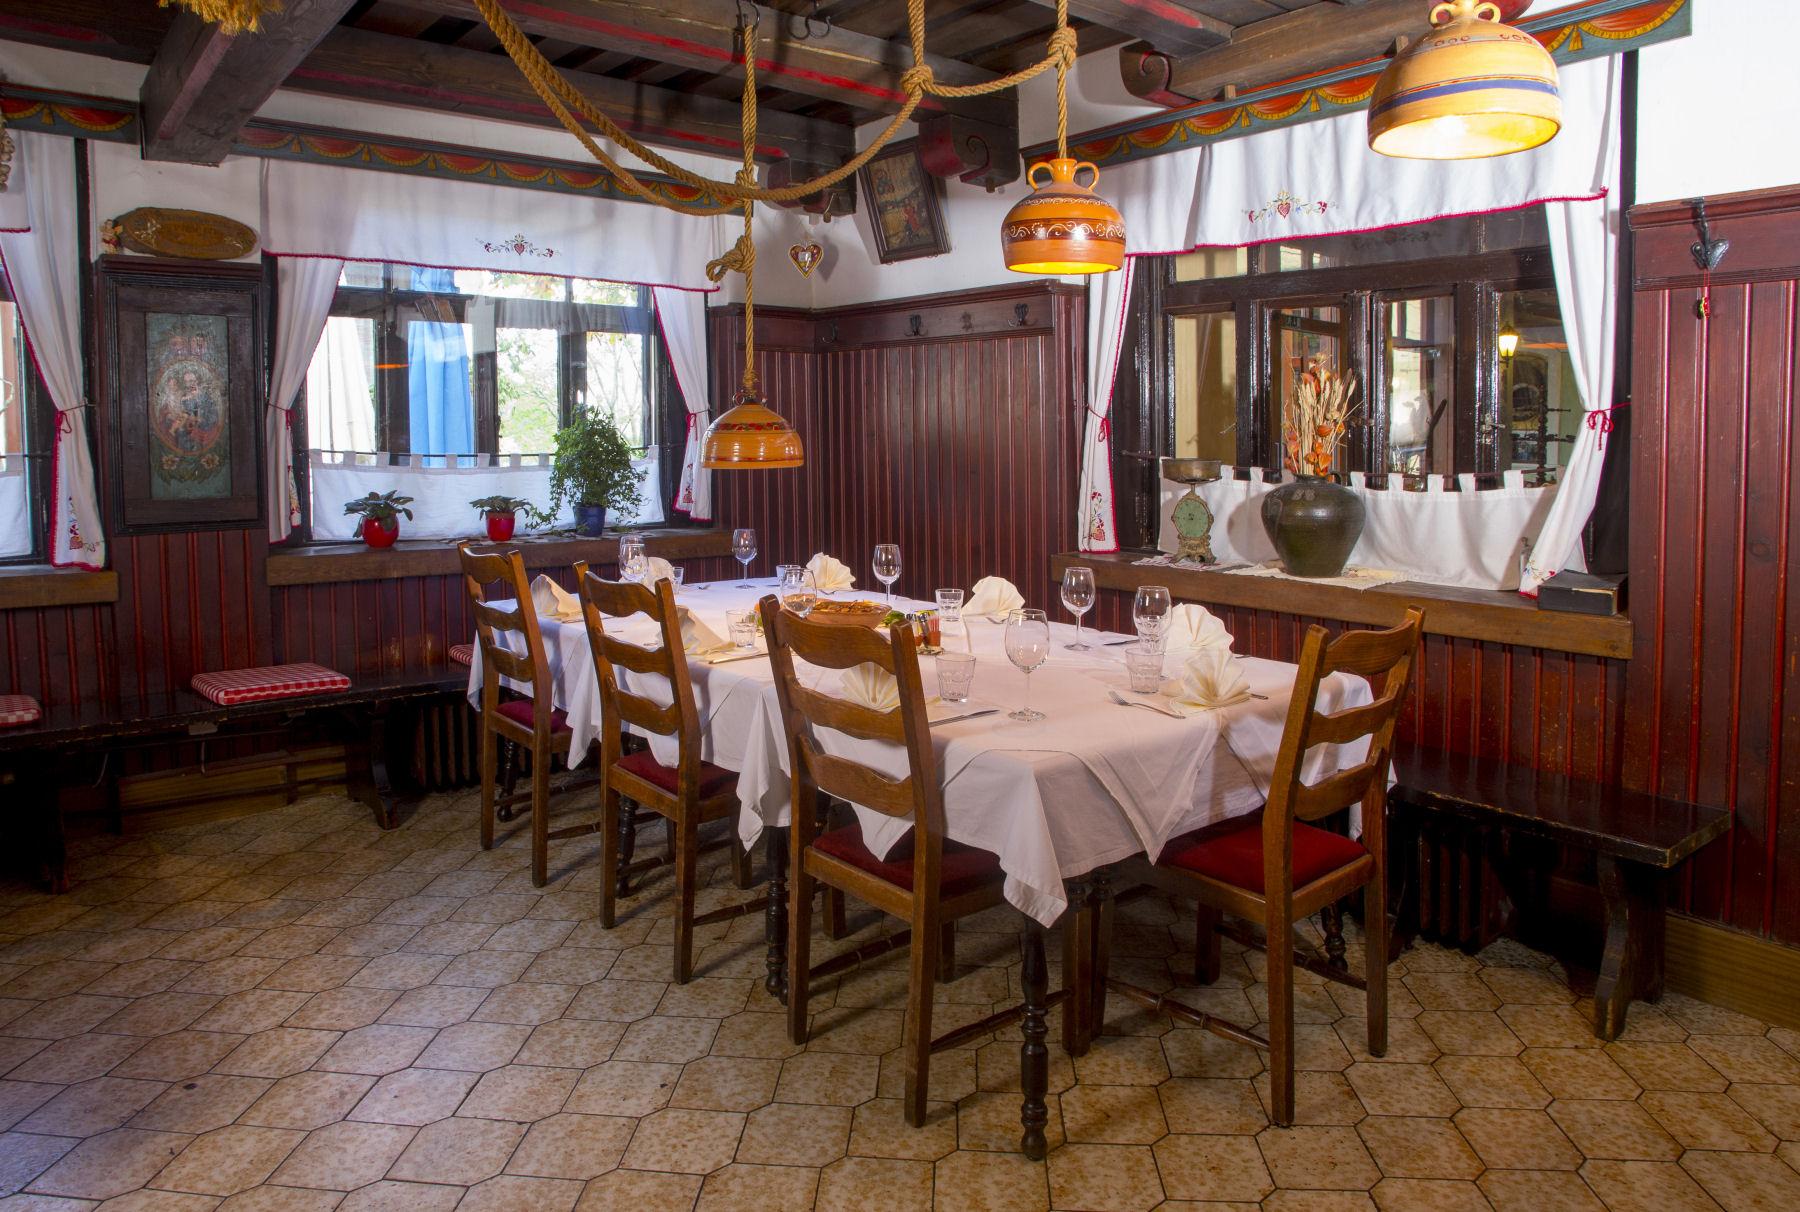 Restaurant Lectar the Joseph's room